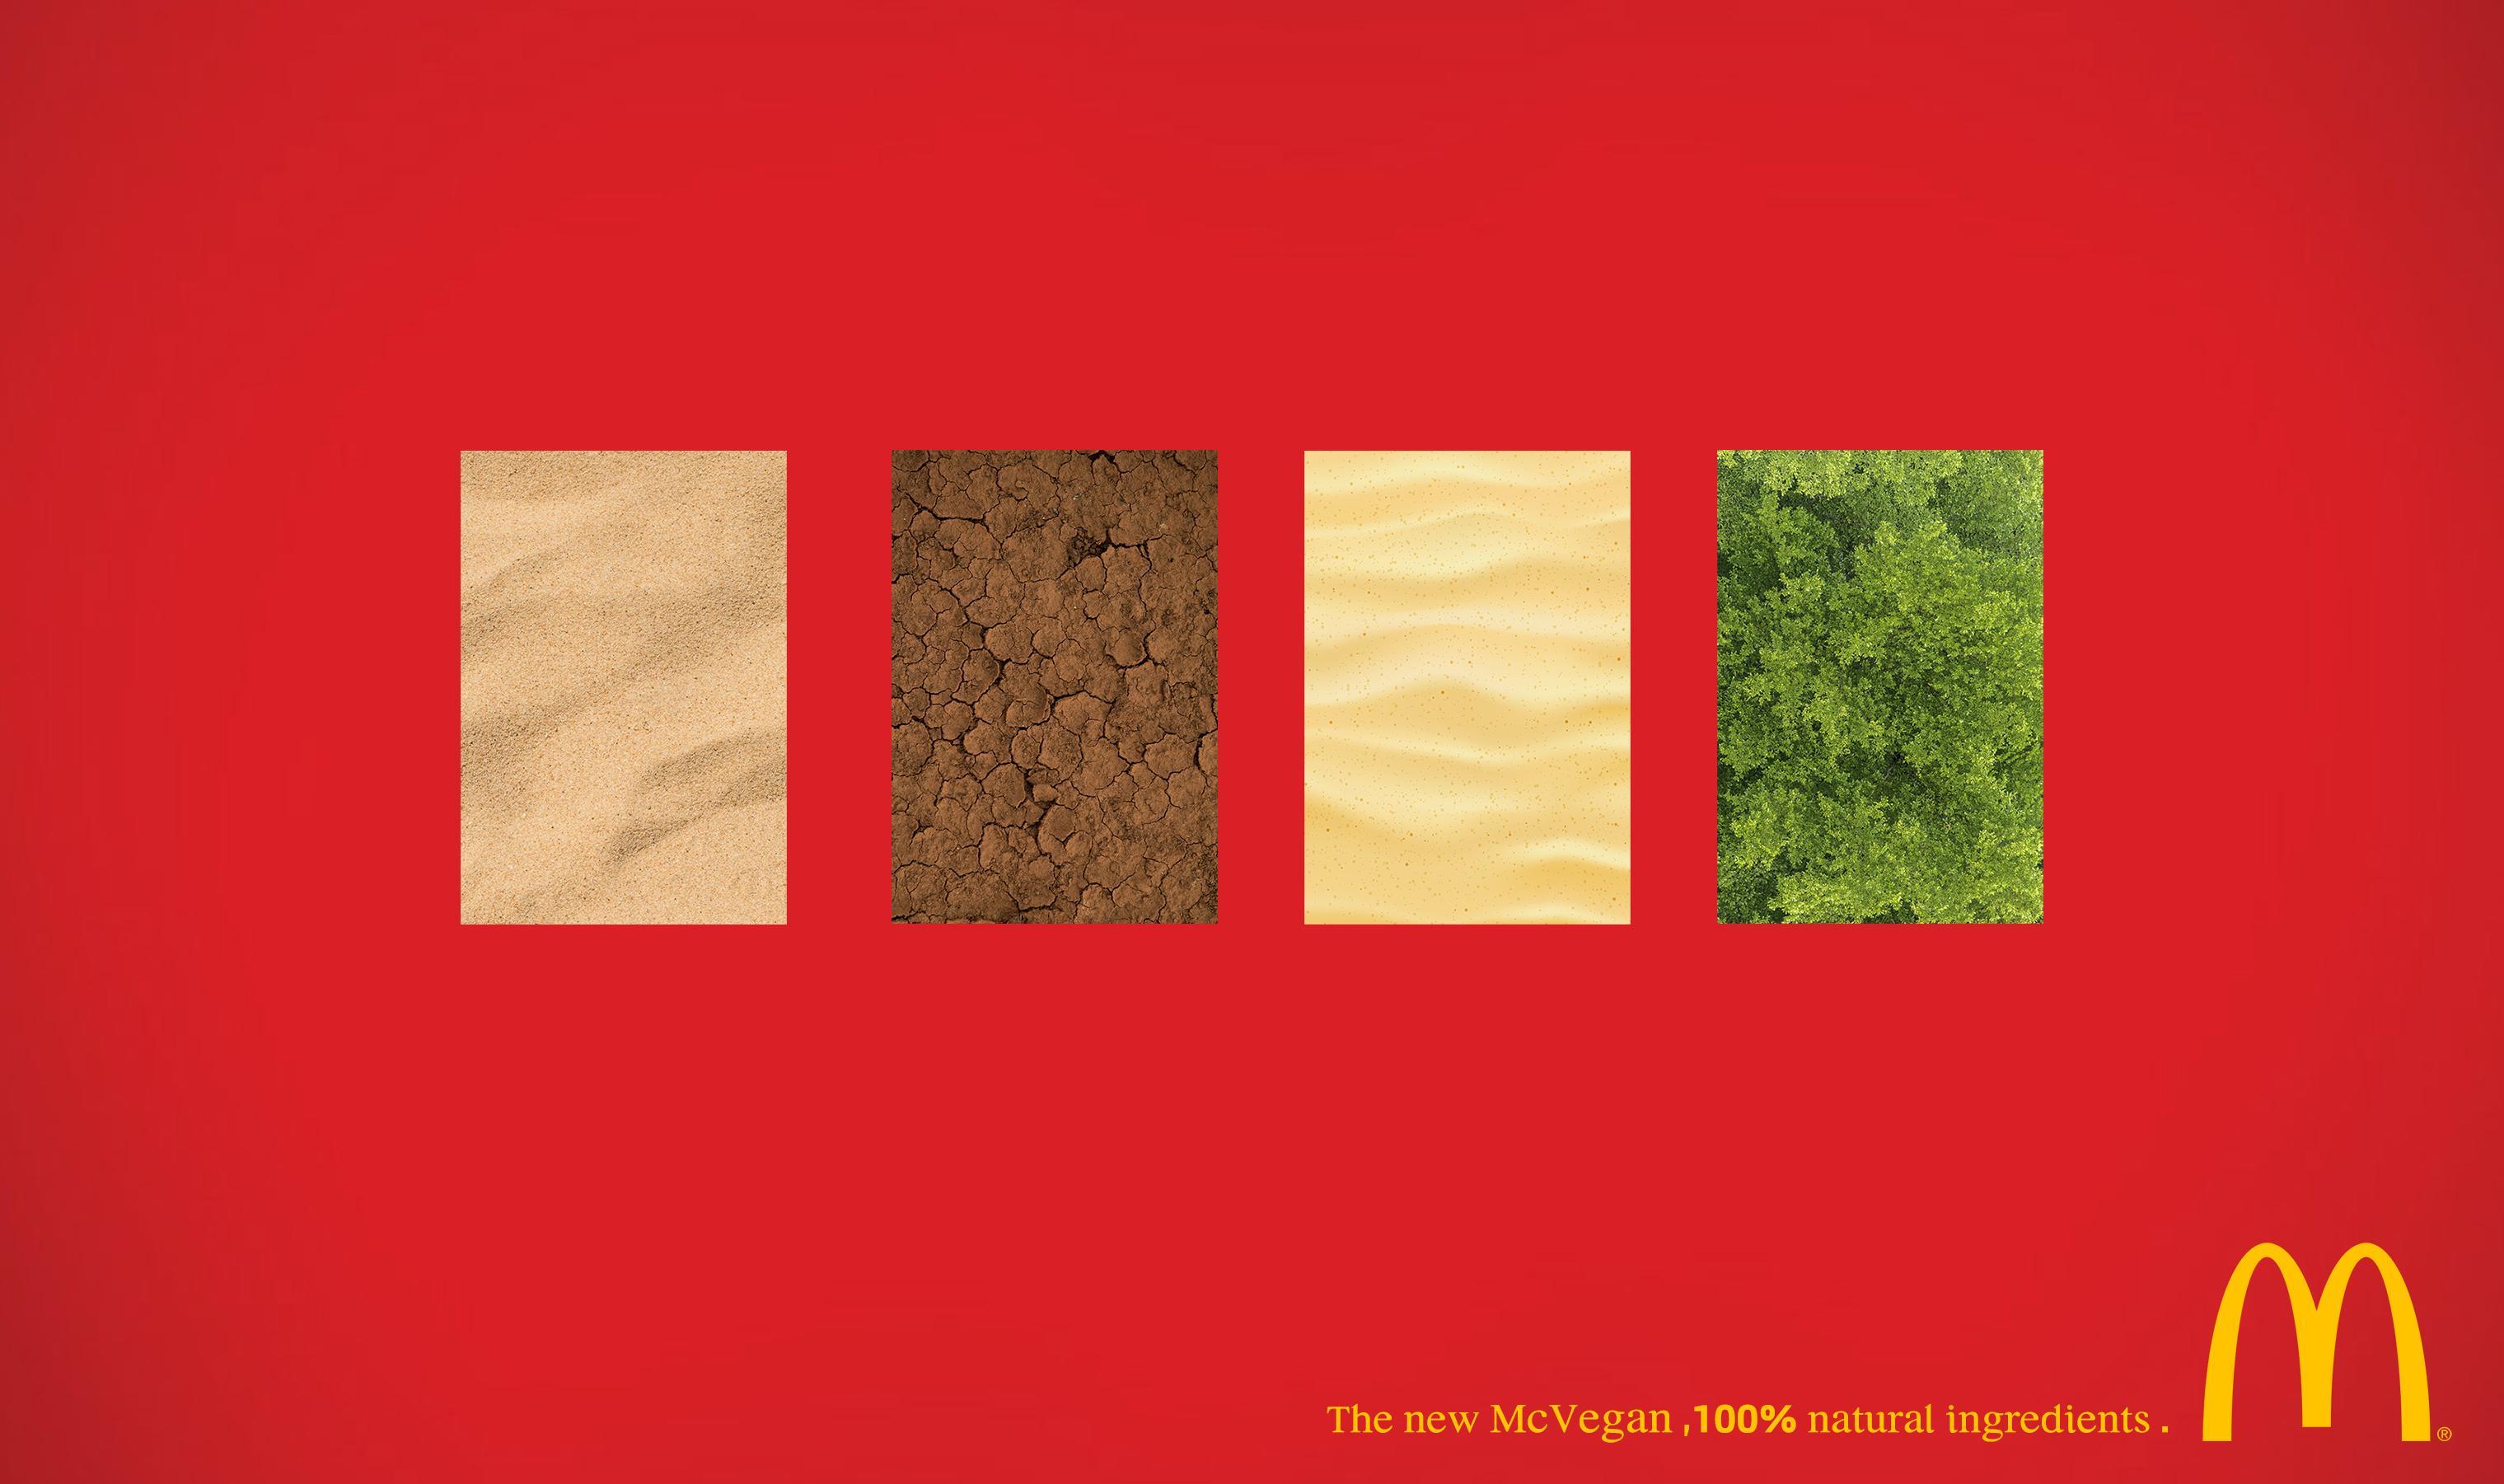 McDonald's Print Ad - 100% Natural Ingredients